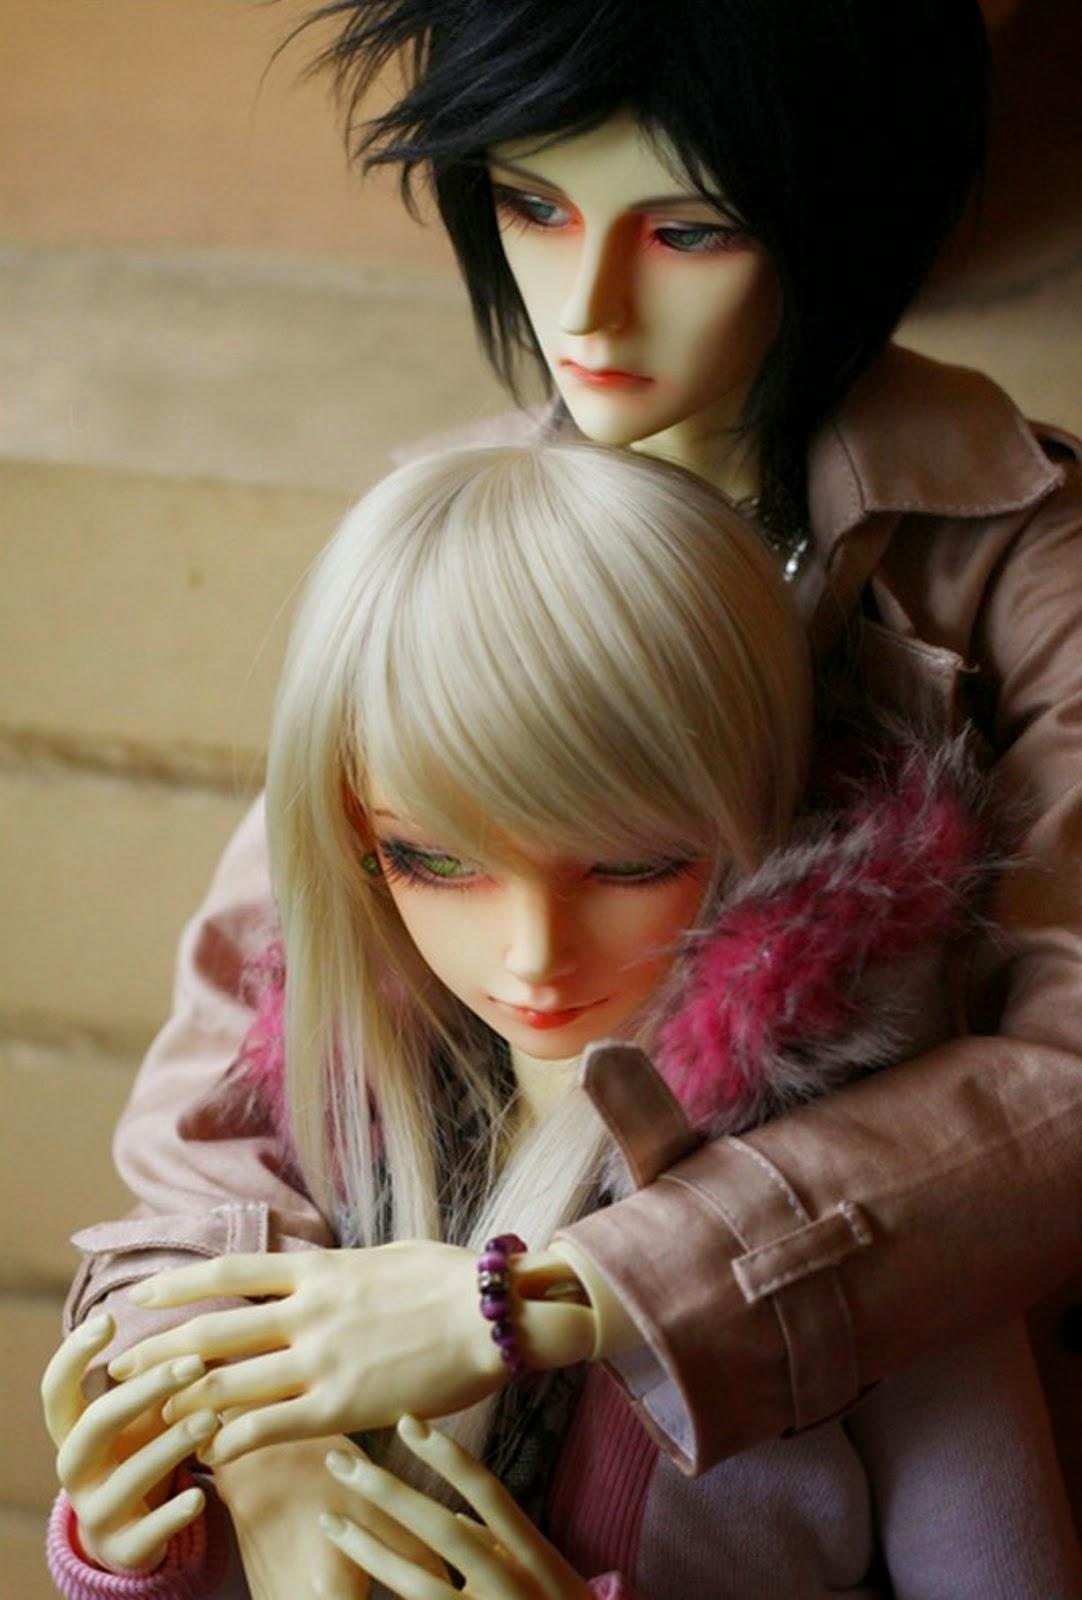 Barbie Love couple Wallpaper : pretty Barbie Doll couple Wallpapers Free Download - FREE ALL HD WALLPAPERS DOWNLOAD